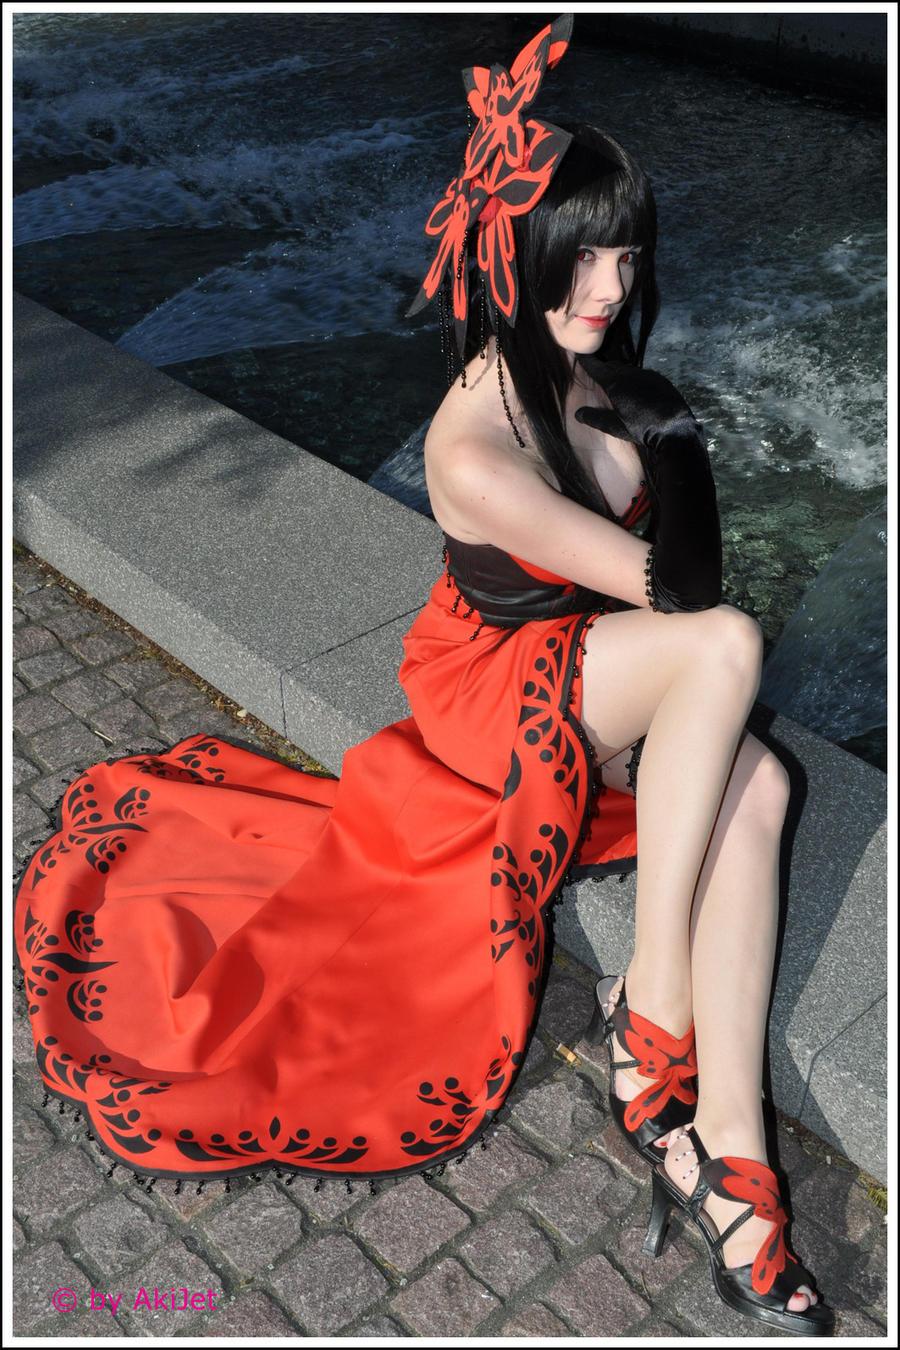 xxxHOLiC: Yuko shows her legs by Mokuyo